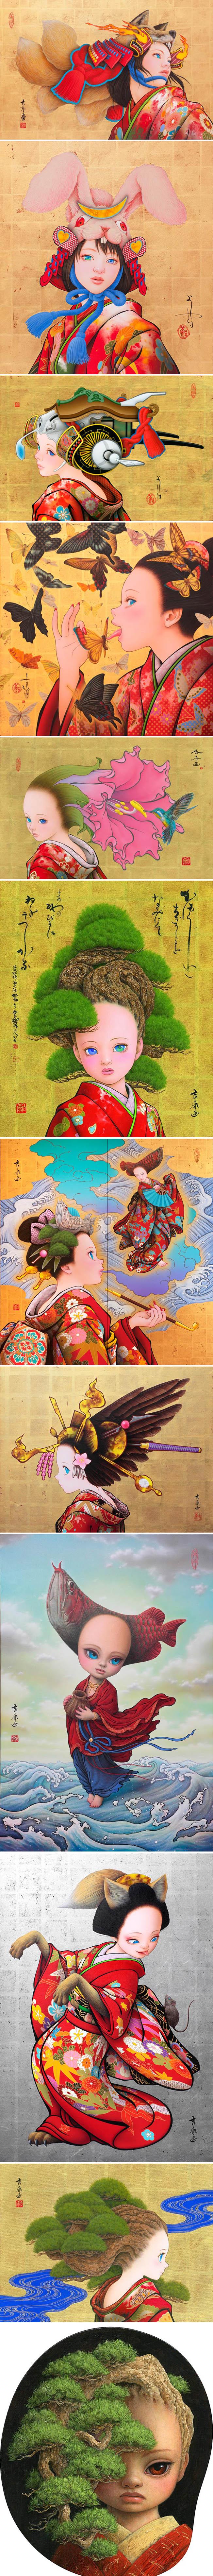 Tamura Yoshiyasu une o moderno mangá com a arte tradicional japonesa stylo urbano